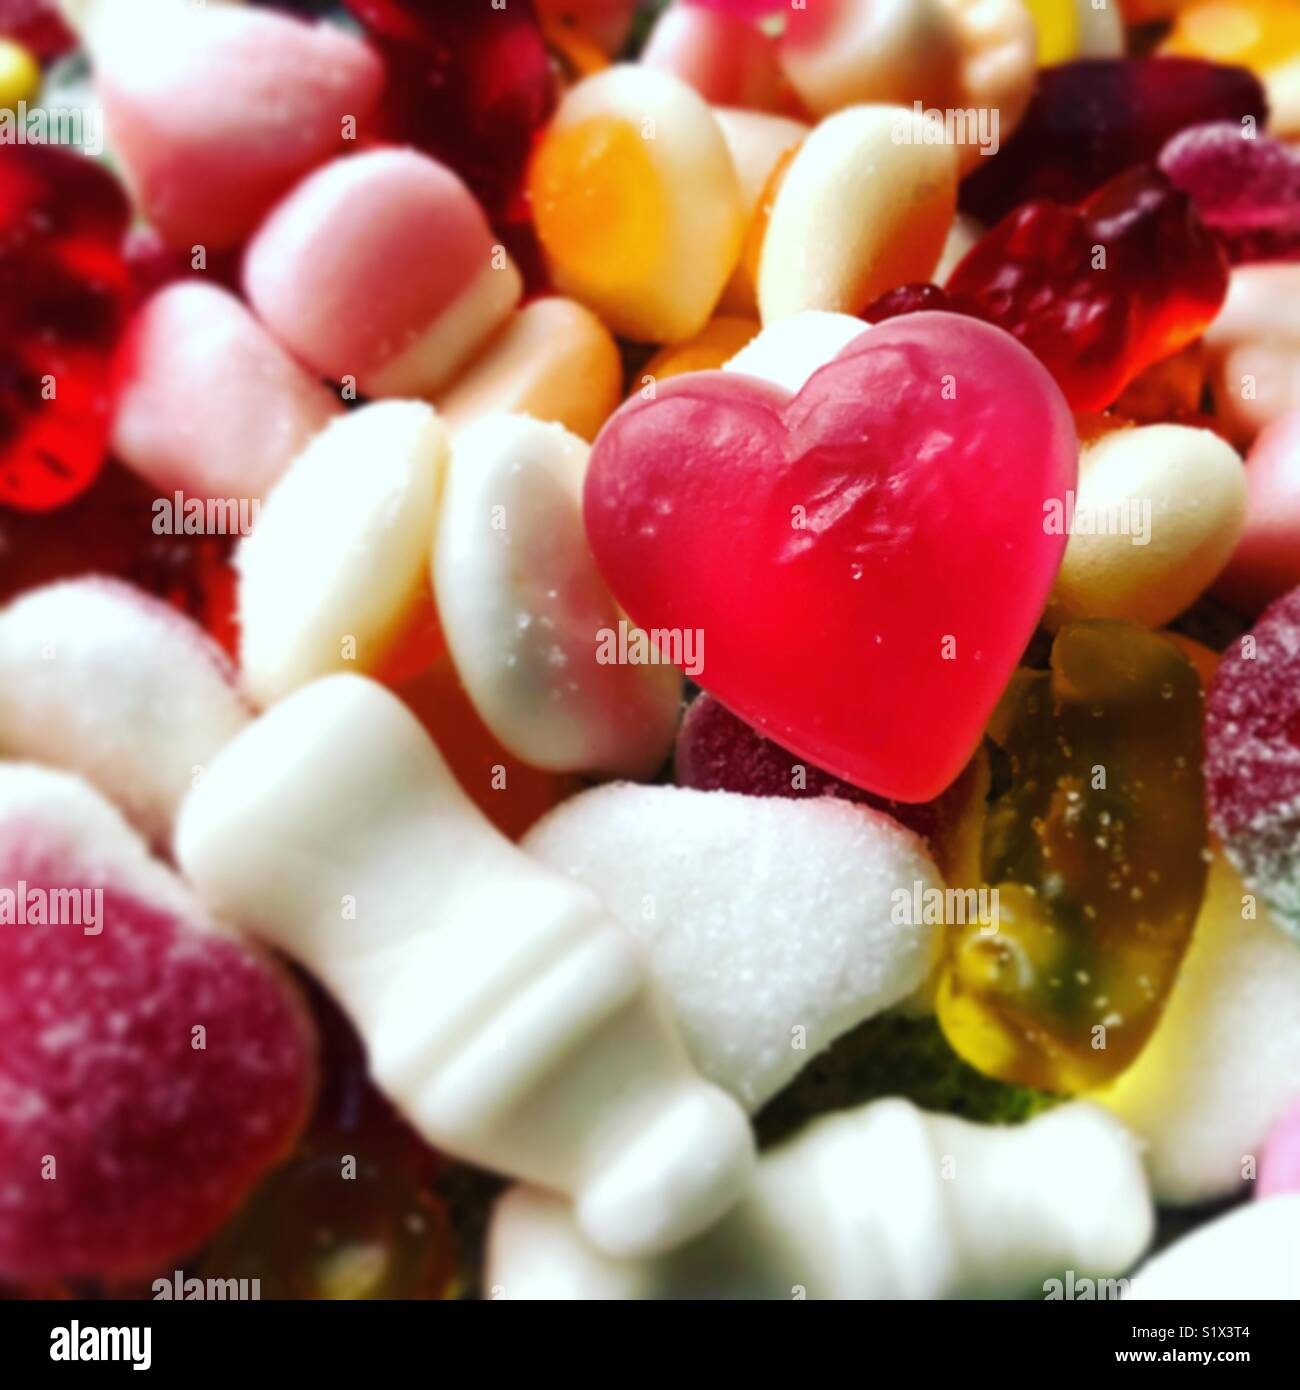 Vista de cerca de un dulce en forma de corazón Imagen De Stock